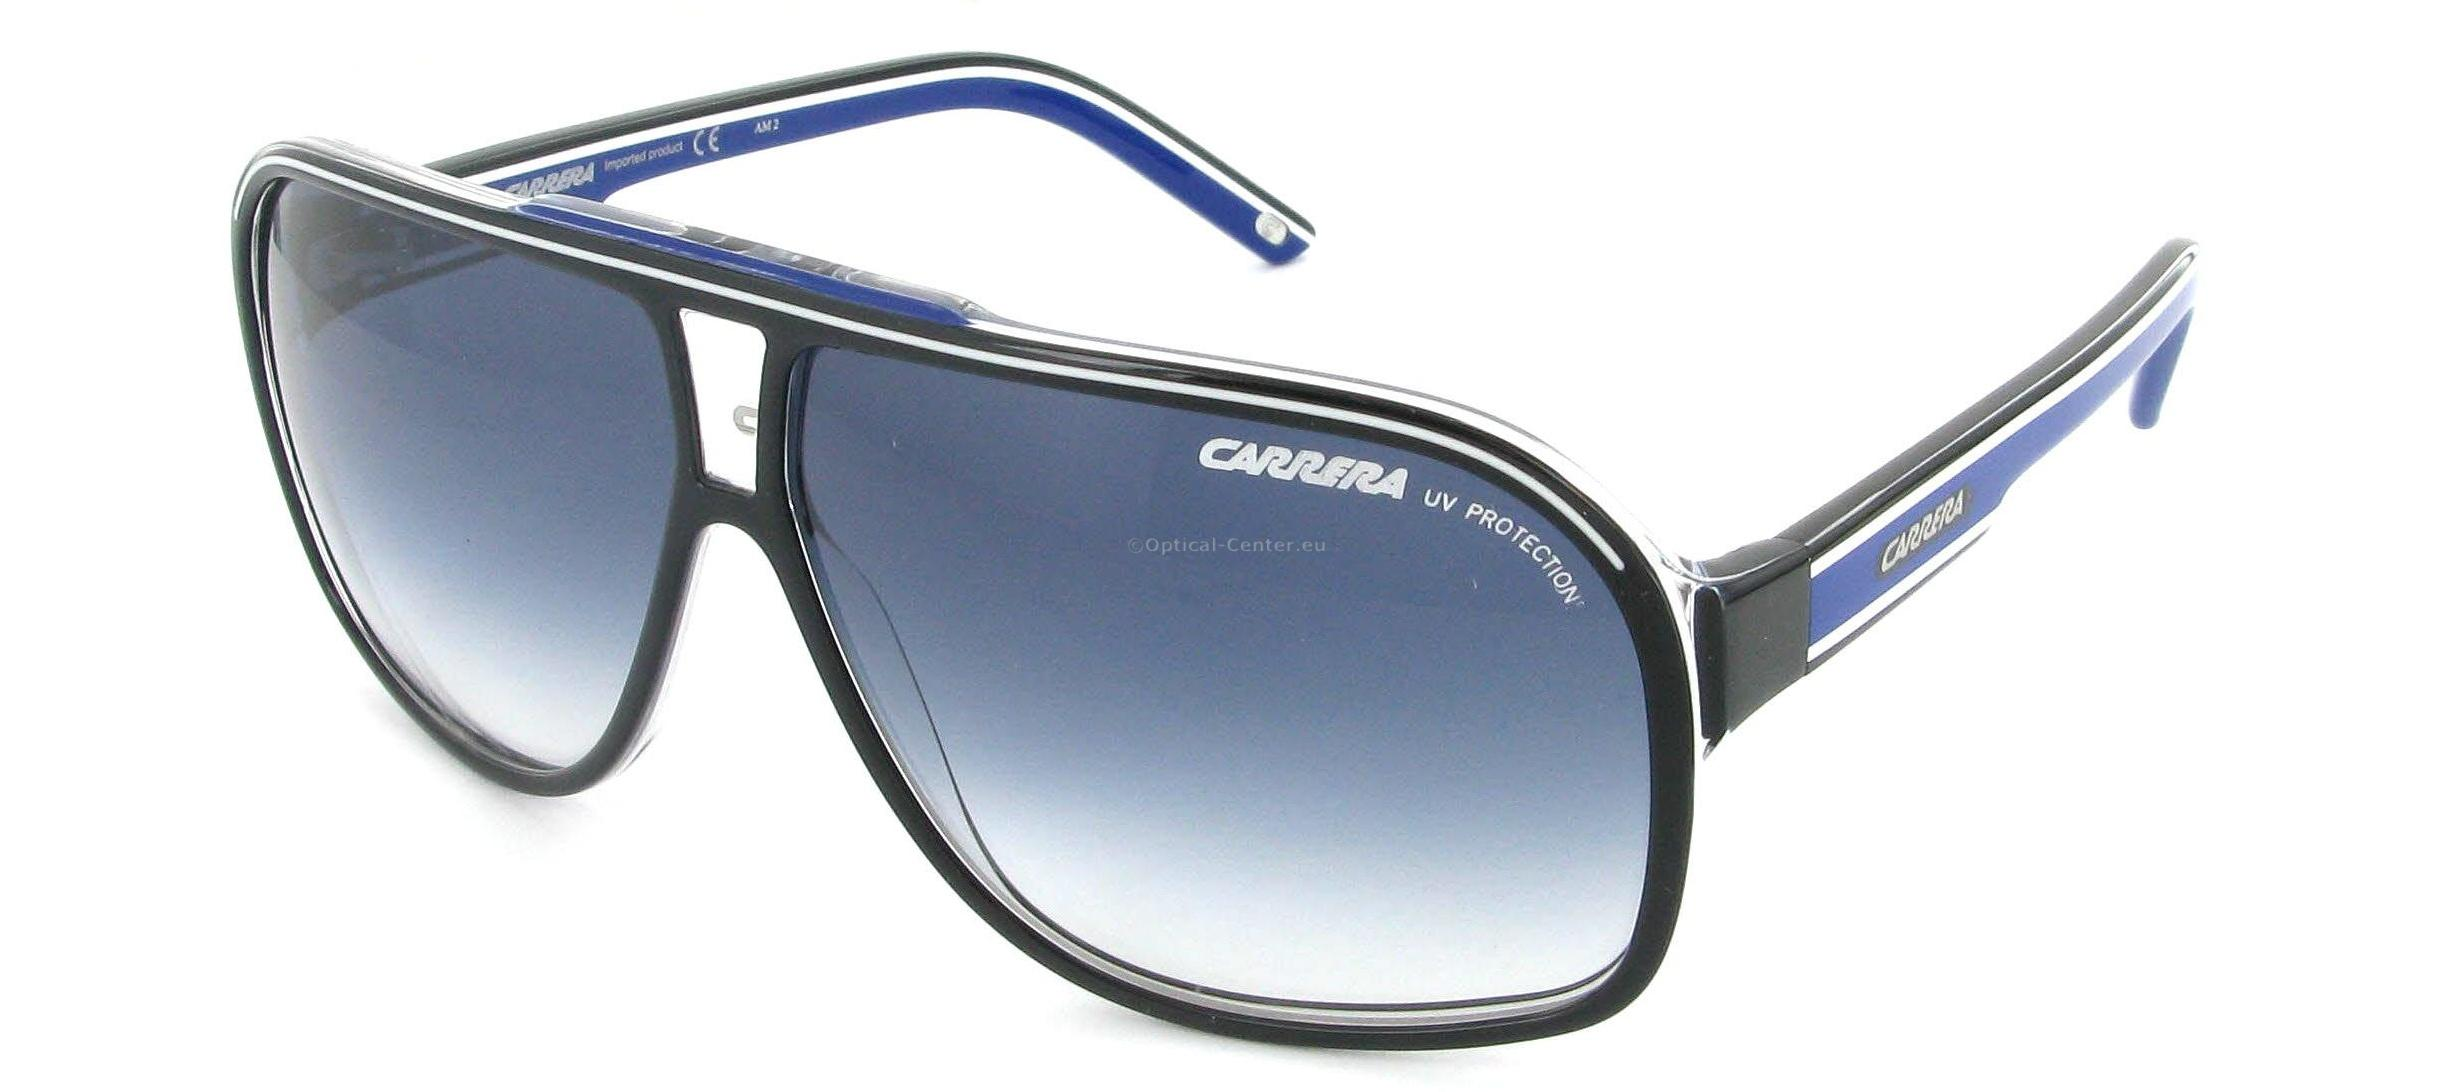 content lunette carrera bleu